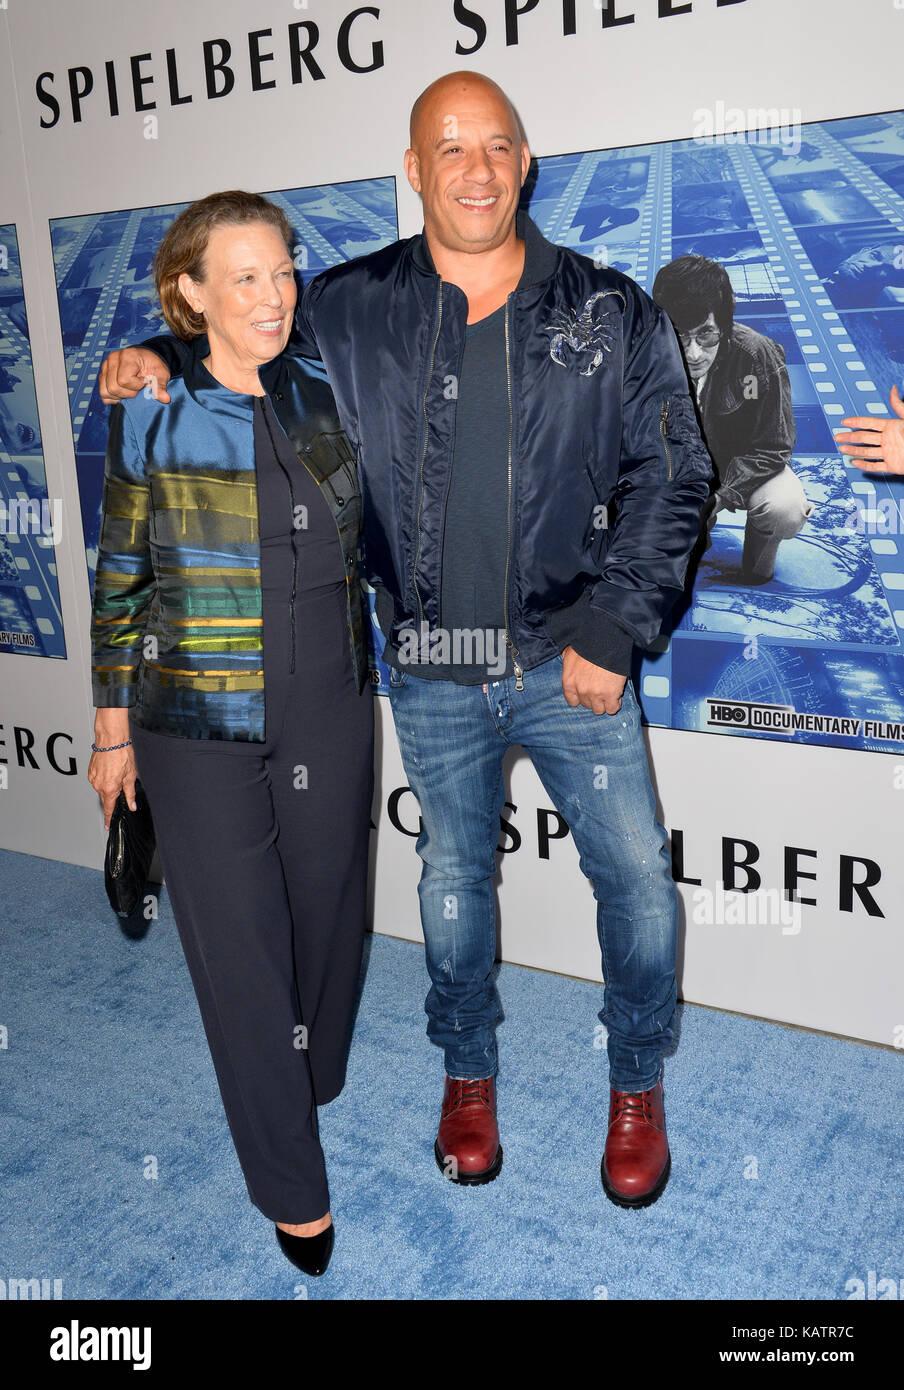 Los Angeles, USA. 26th Sep, 2017. Vin Diesel & mother ...Vin Diesel Mother Photos